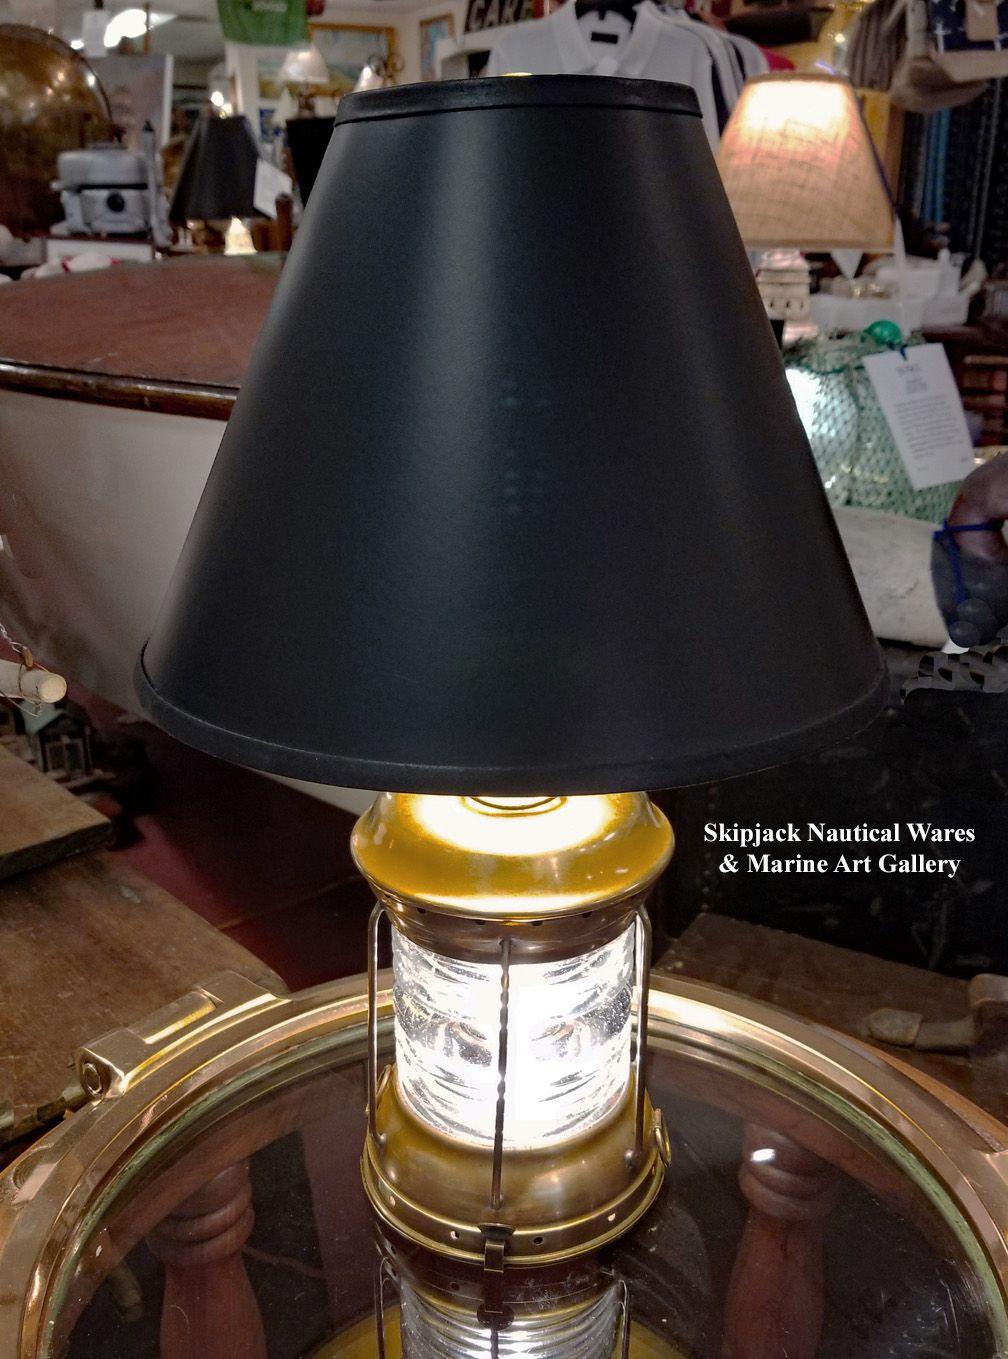 Vintage Brass Perko All Round Navigational Light Nautical Table Lamp Skipjack Nautical Wares Nautical Lamp Vintage Light Lamp Table Lamp Nautical Lamps